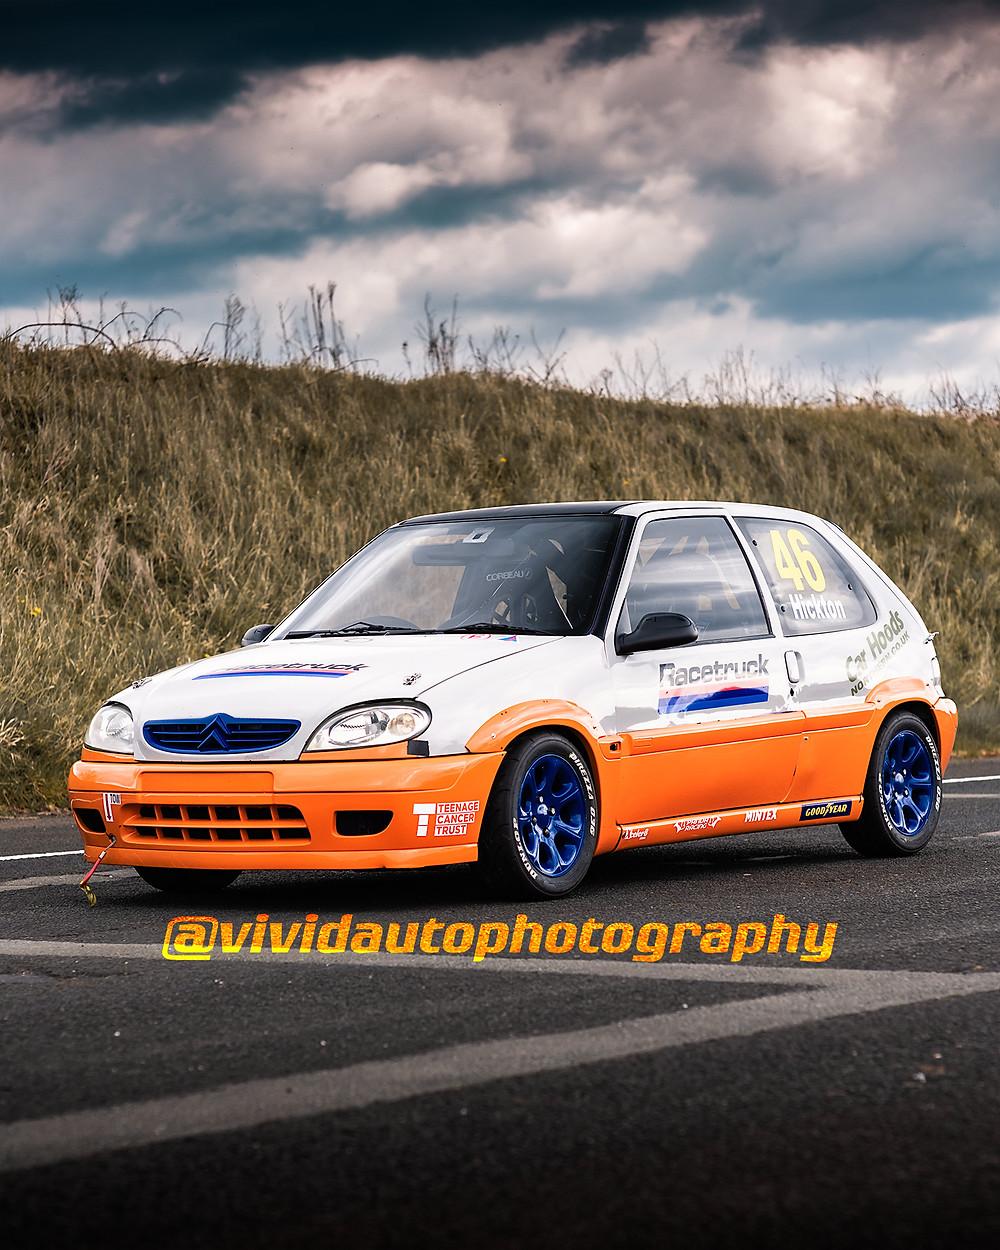 Citroen Saxo | Racetruck UK | Stafford Driving Centre